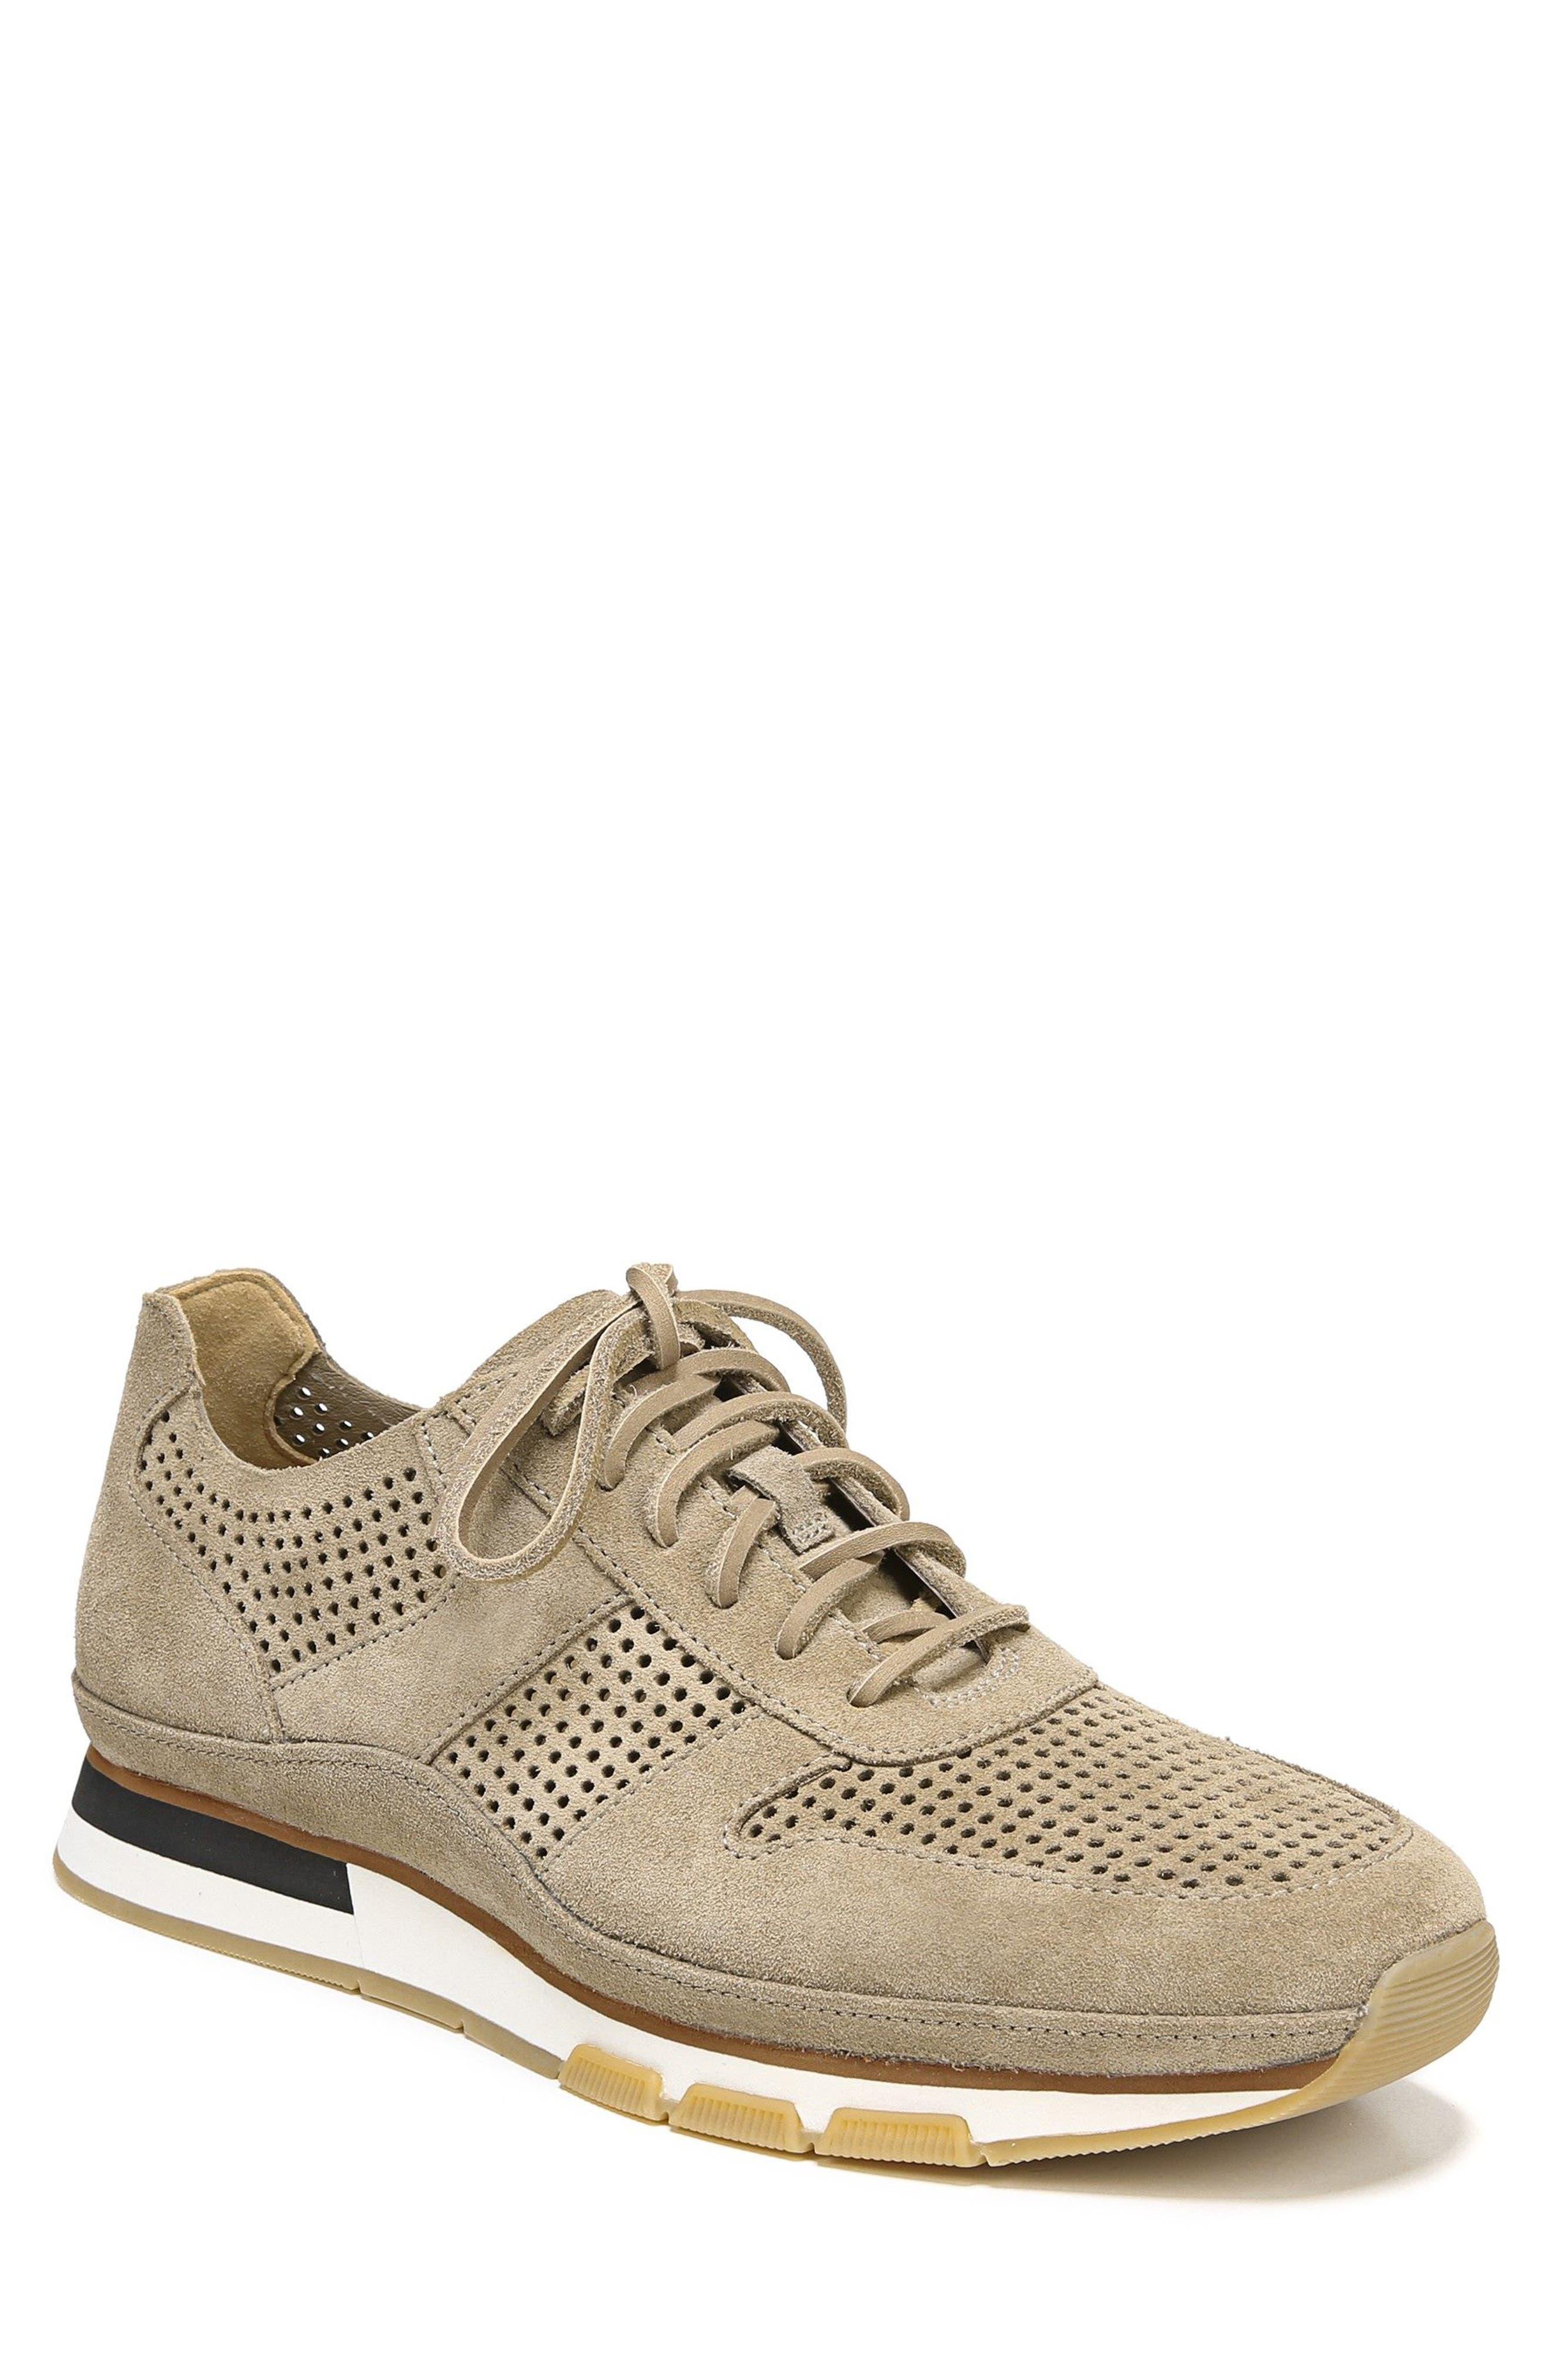 Larson Perforated Sneaker,                             Main thumbnail 1, color,                             250